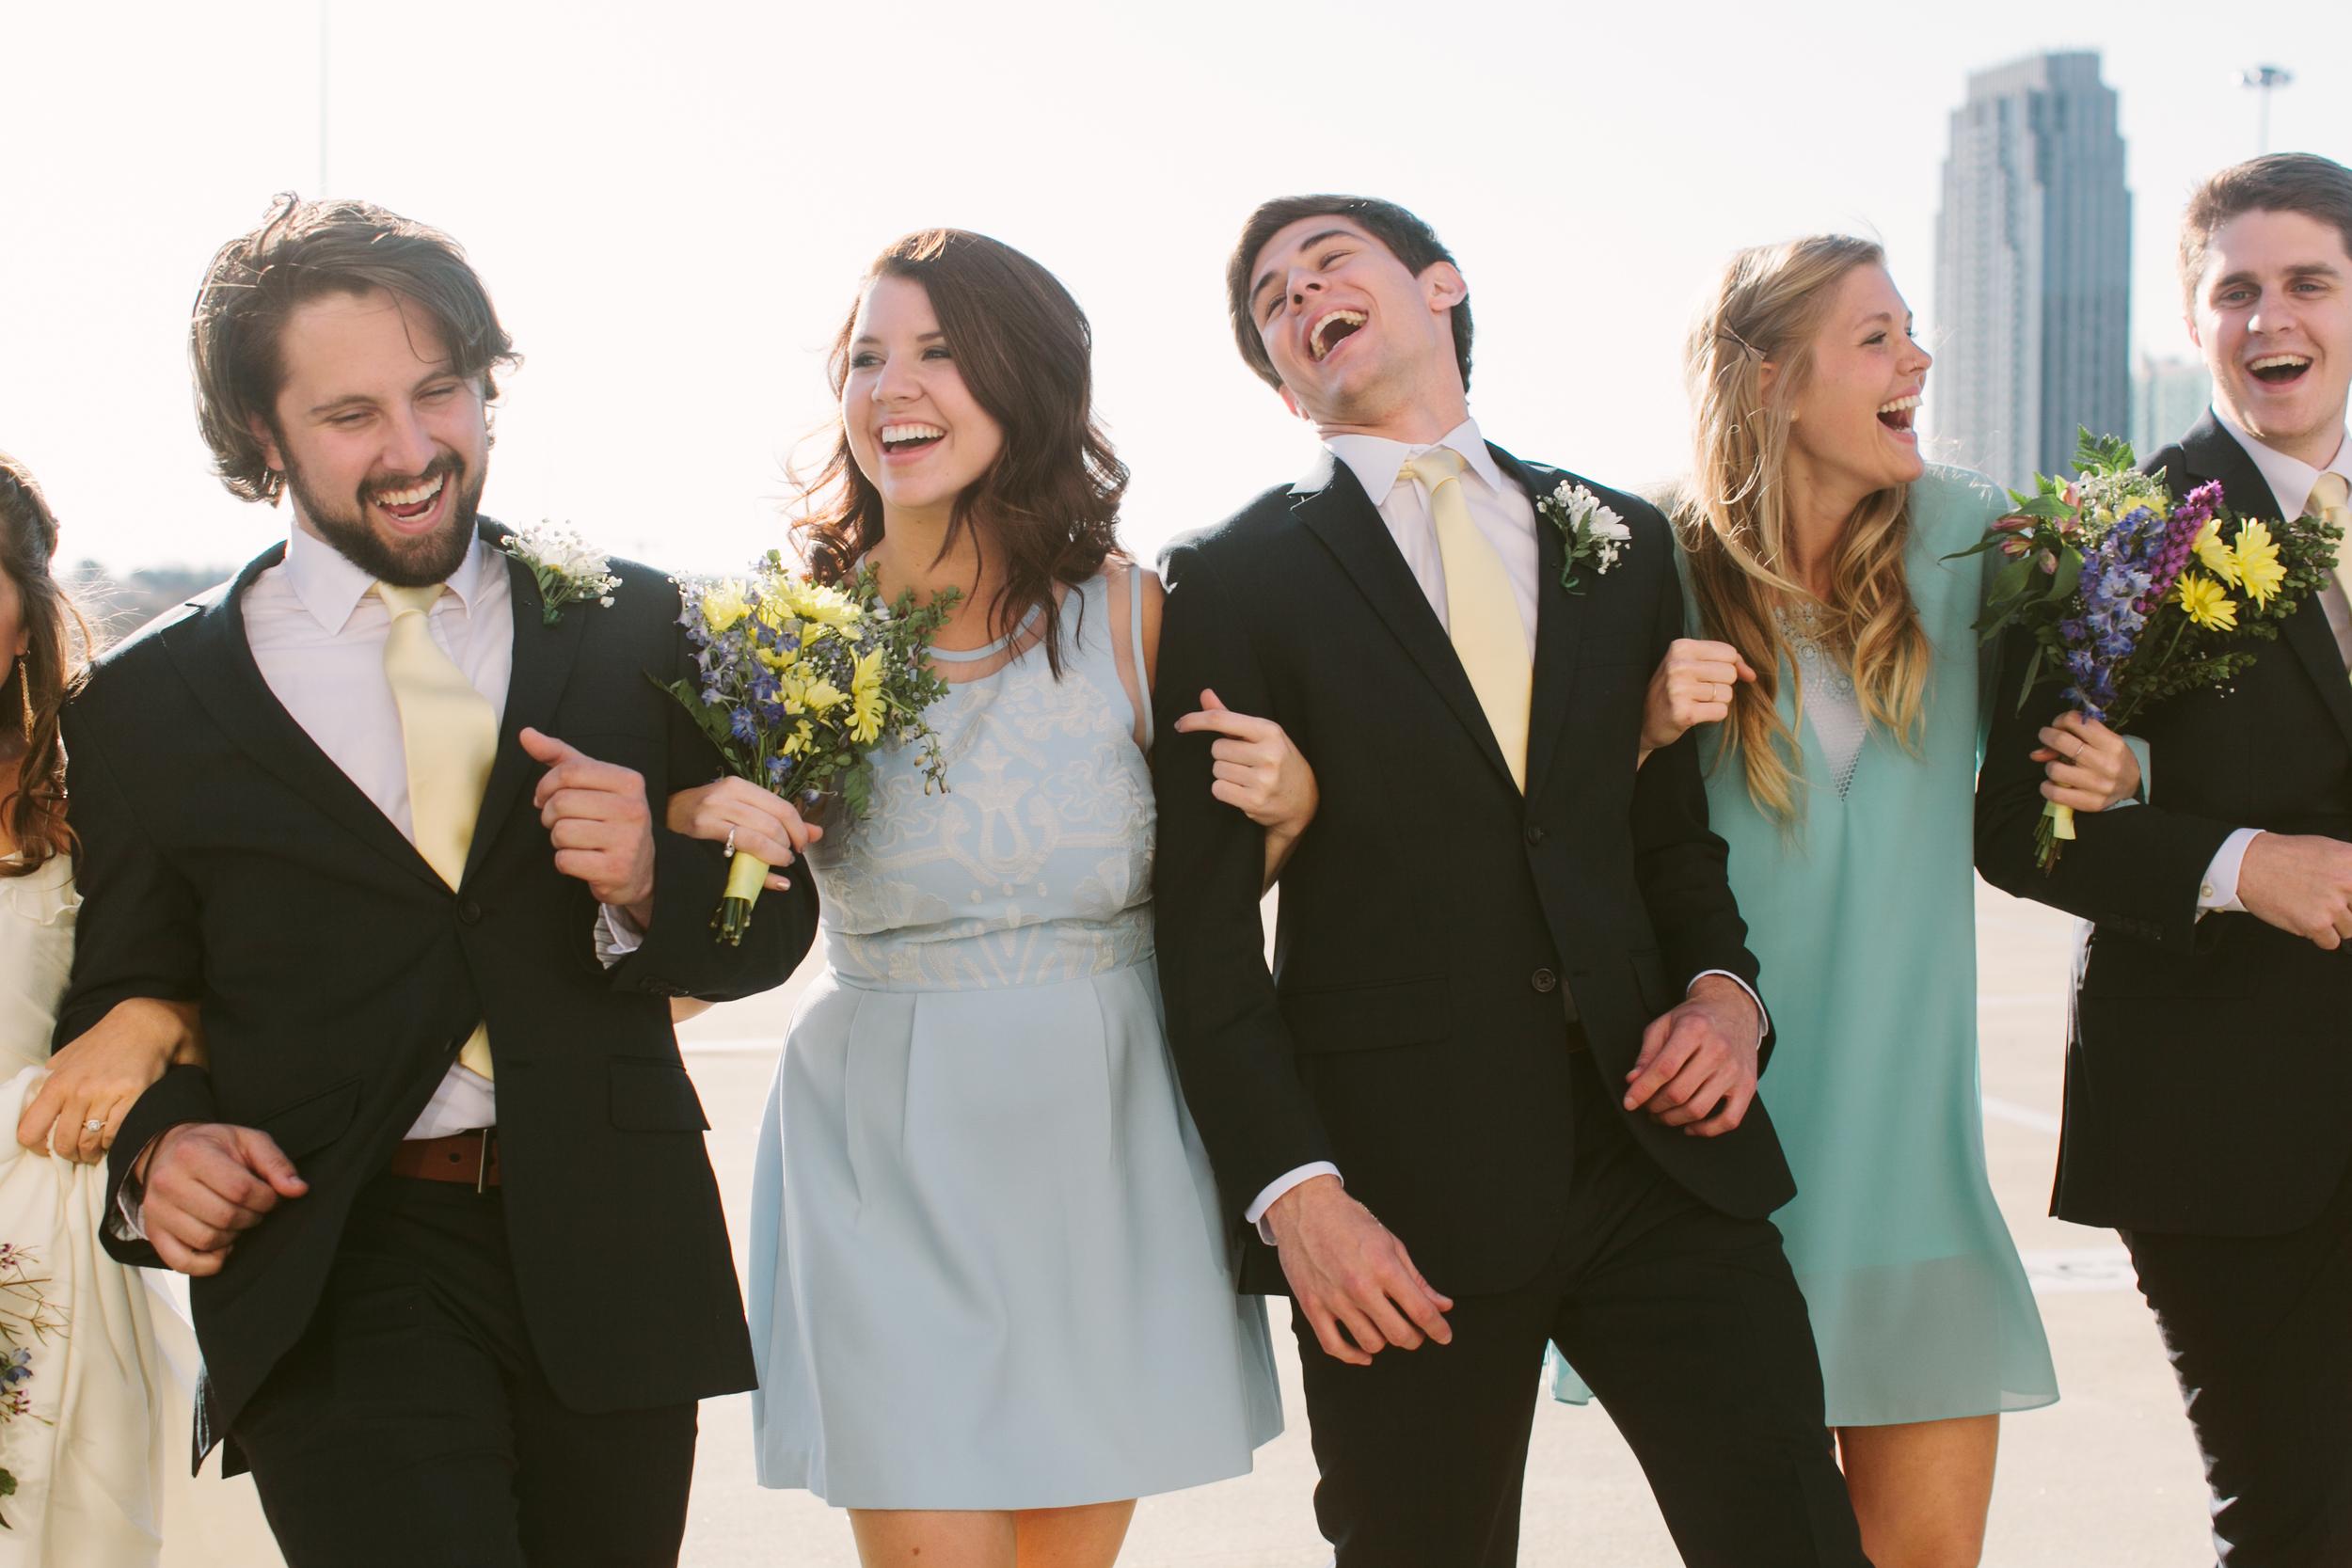 Kathryn-McCrary-Photography-Atlanta-Wedding-Photographer-34.jpg